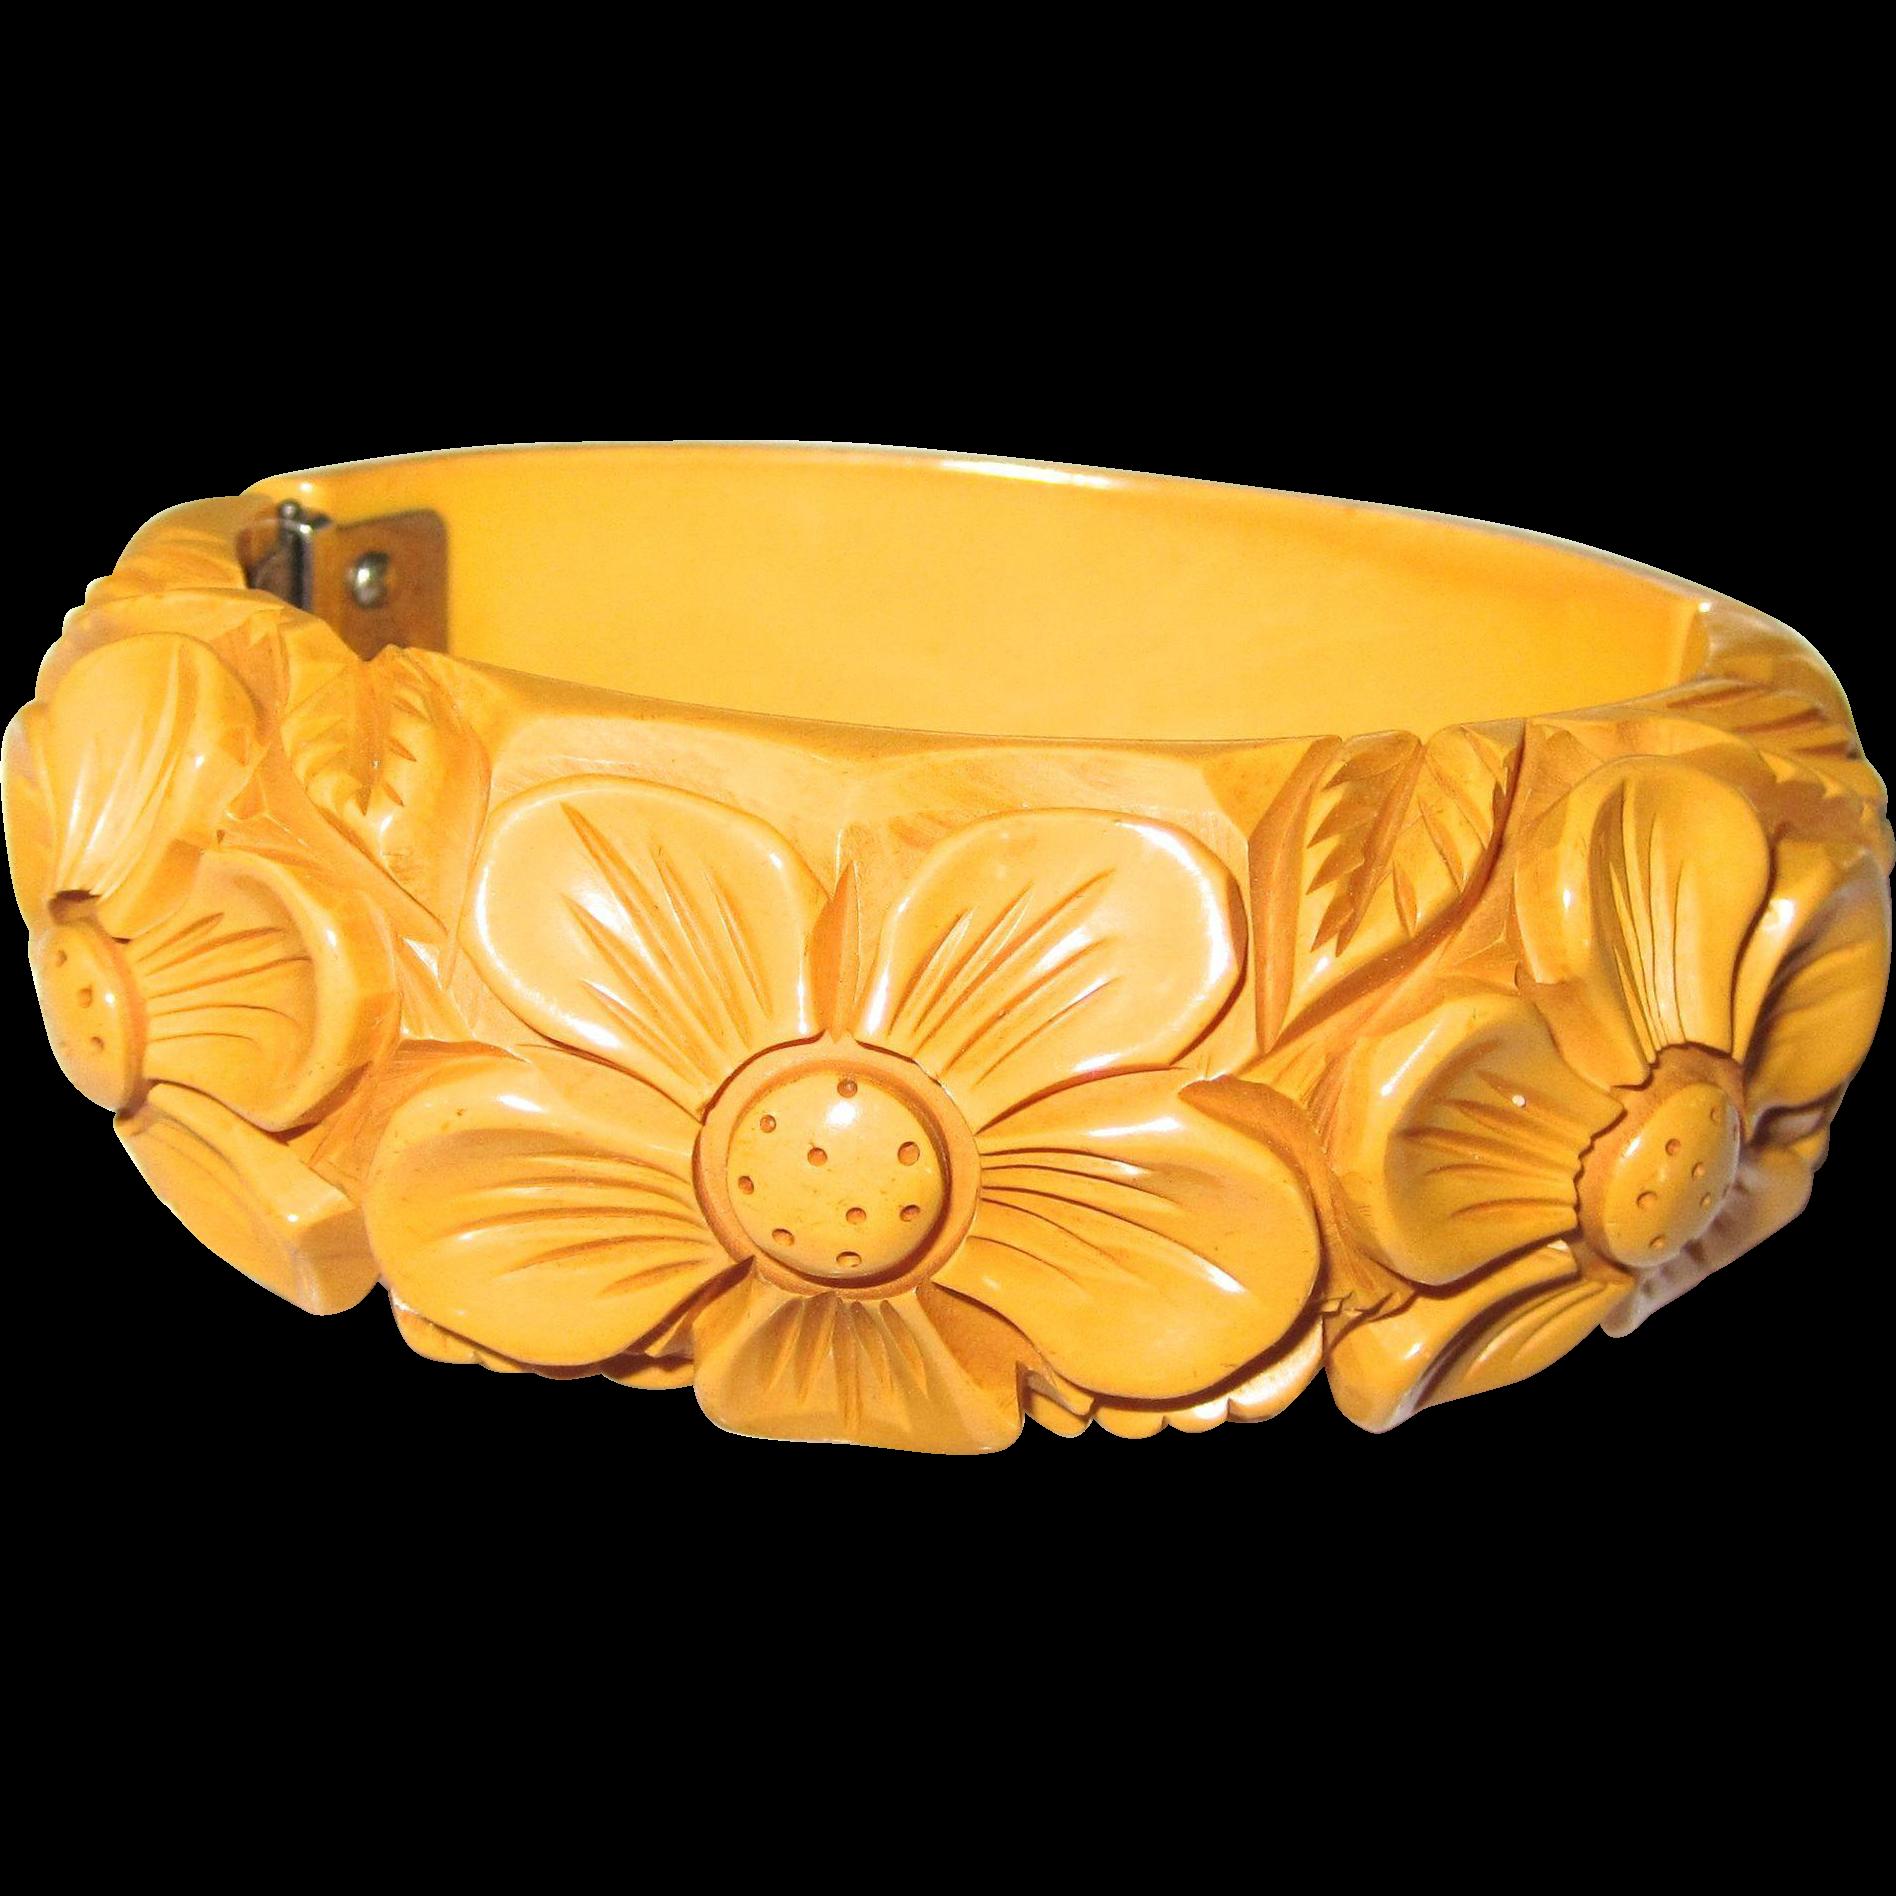 Heavily Deeply Carved Dark Cream Bakelite Hinge Bracelet Clamper